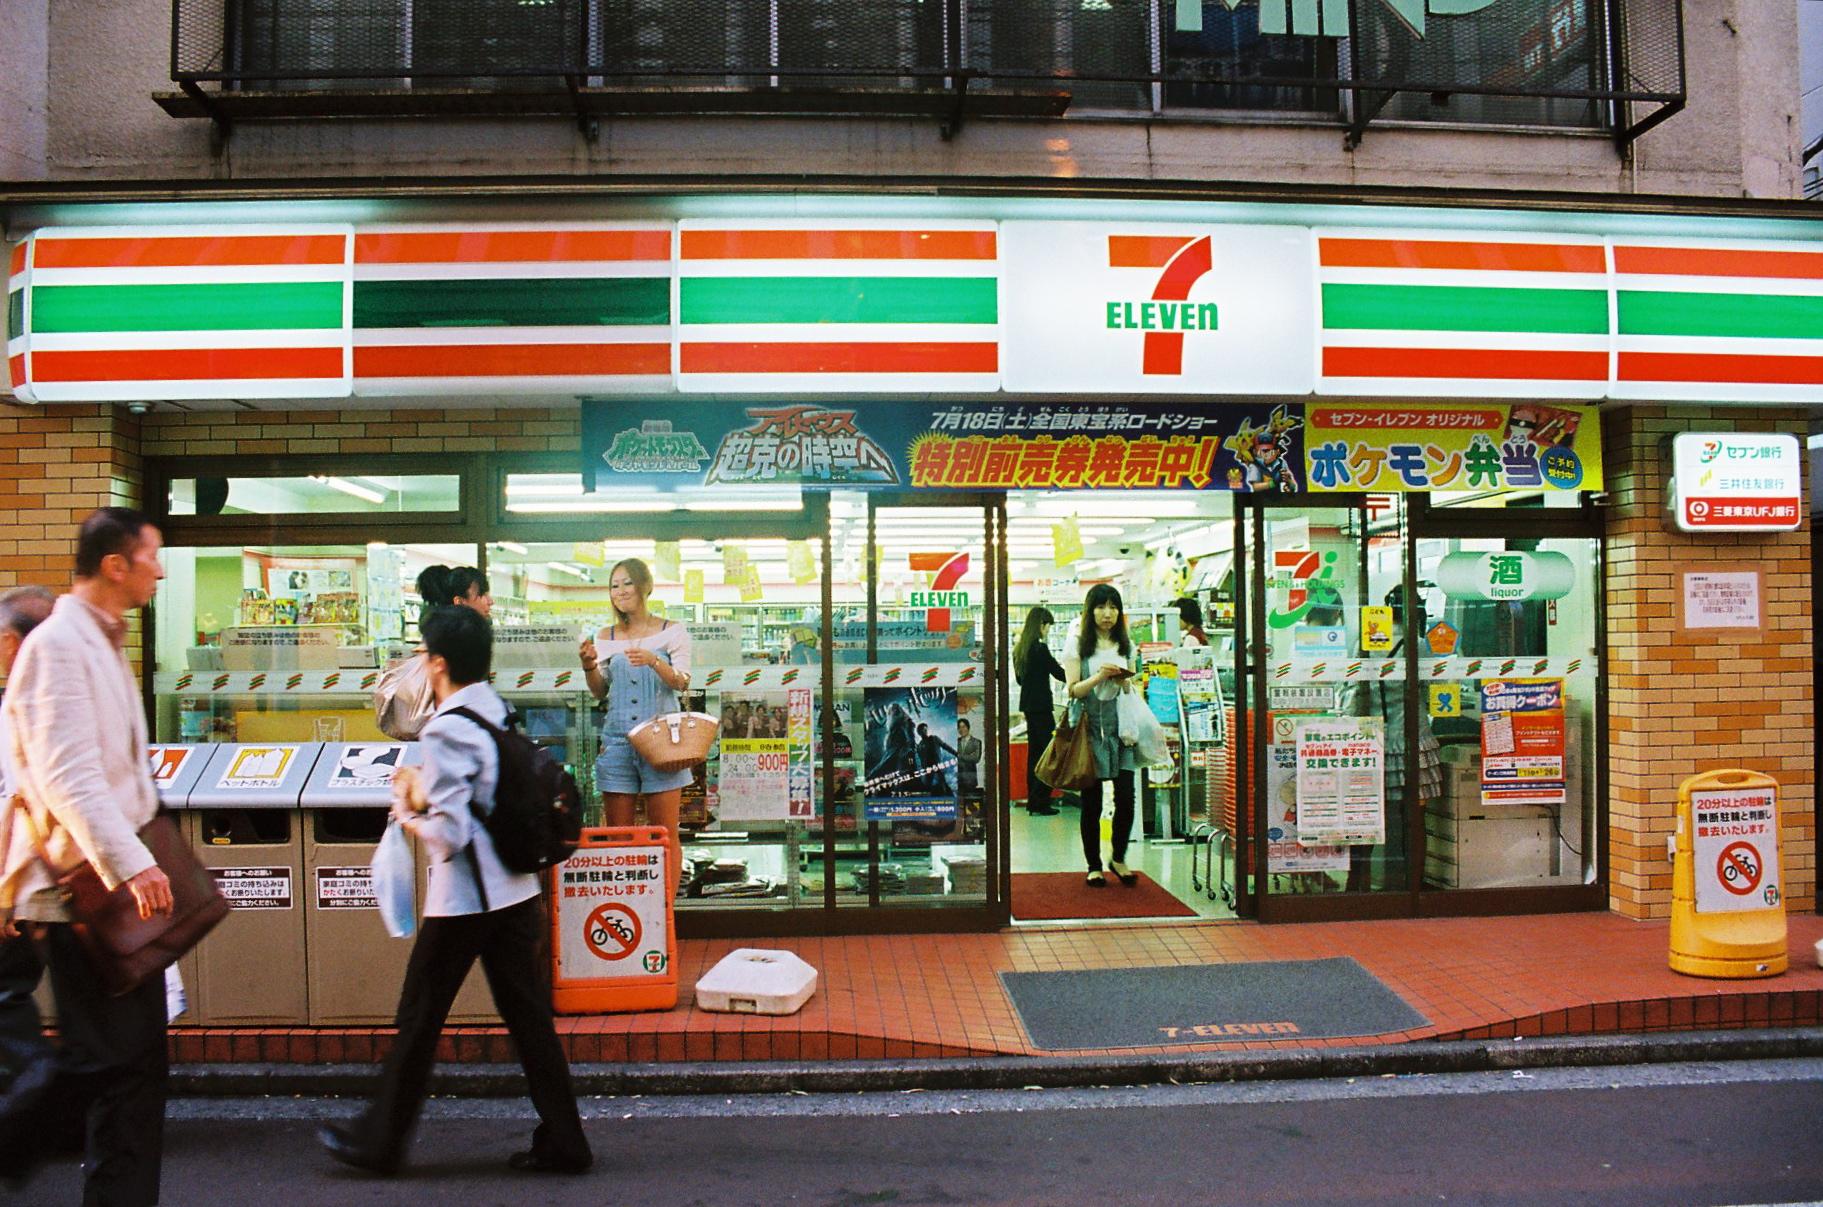 Seven Eleven in Japan